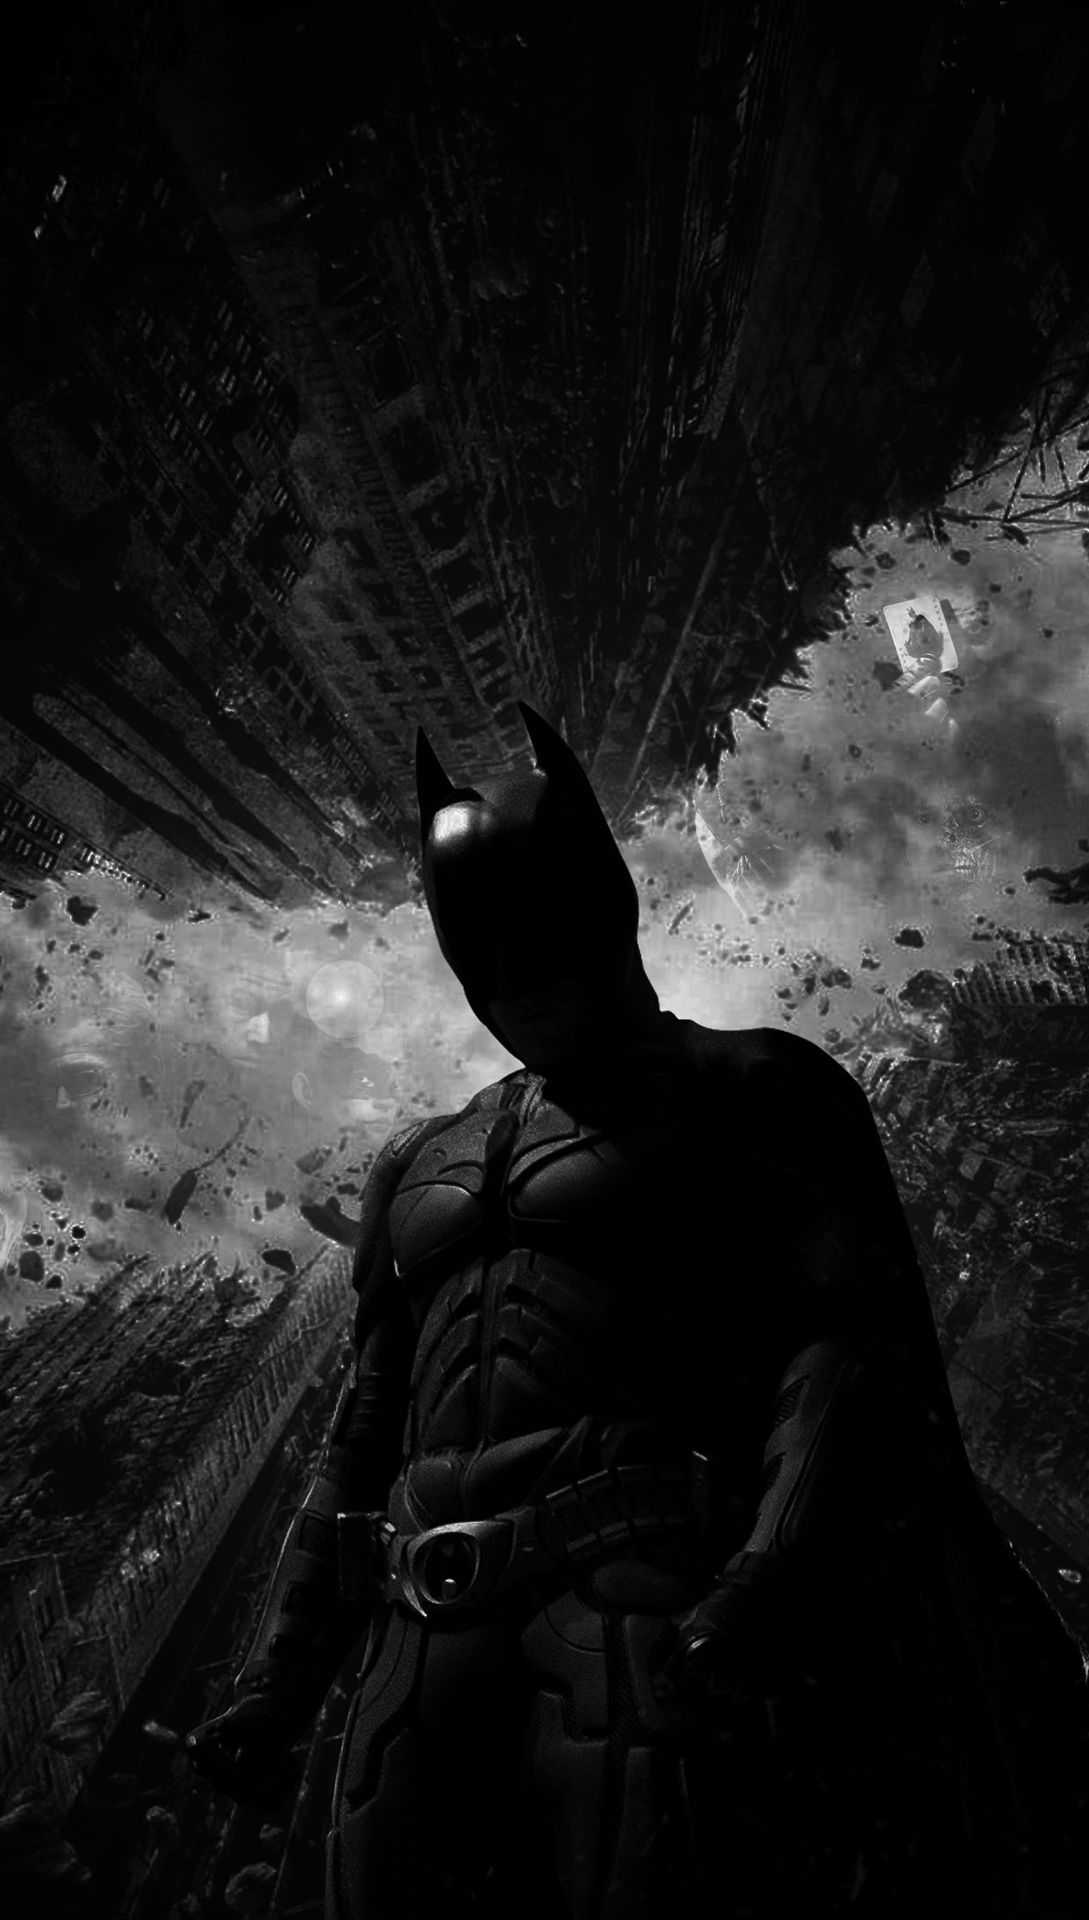 Fortnite Dark Knight Wallpapers Top Free Fortnite Dark Knight Backgrounds Wallpaperaccess